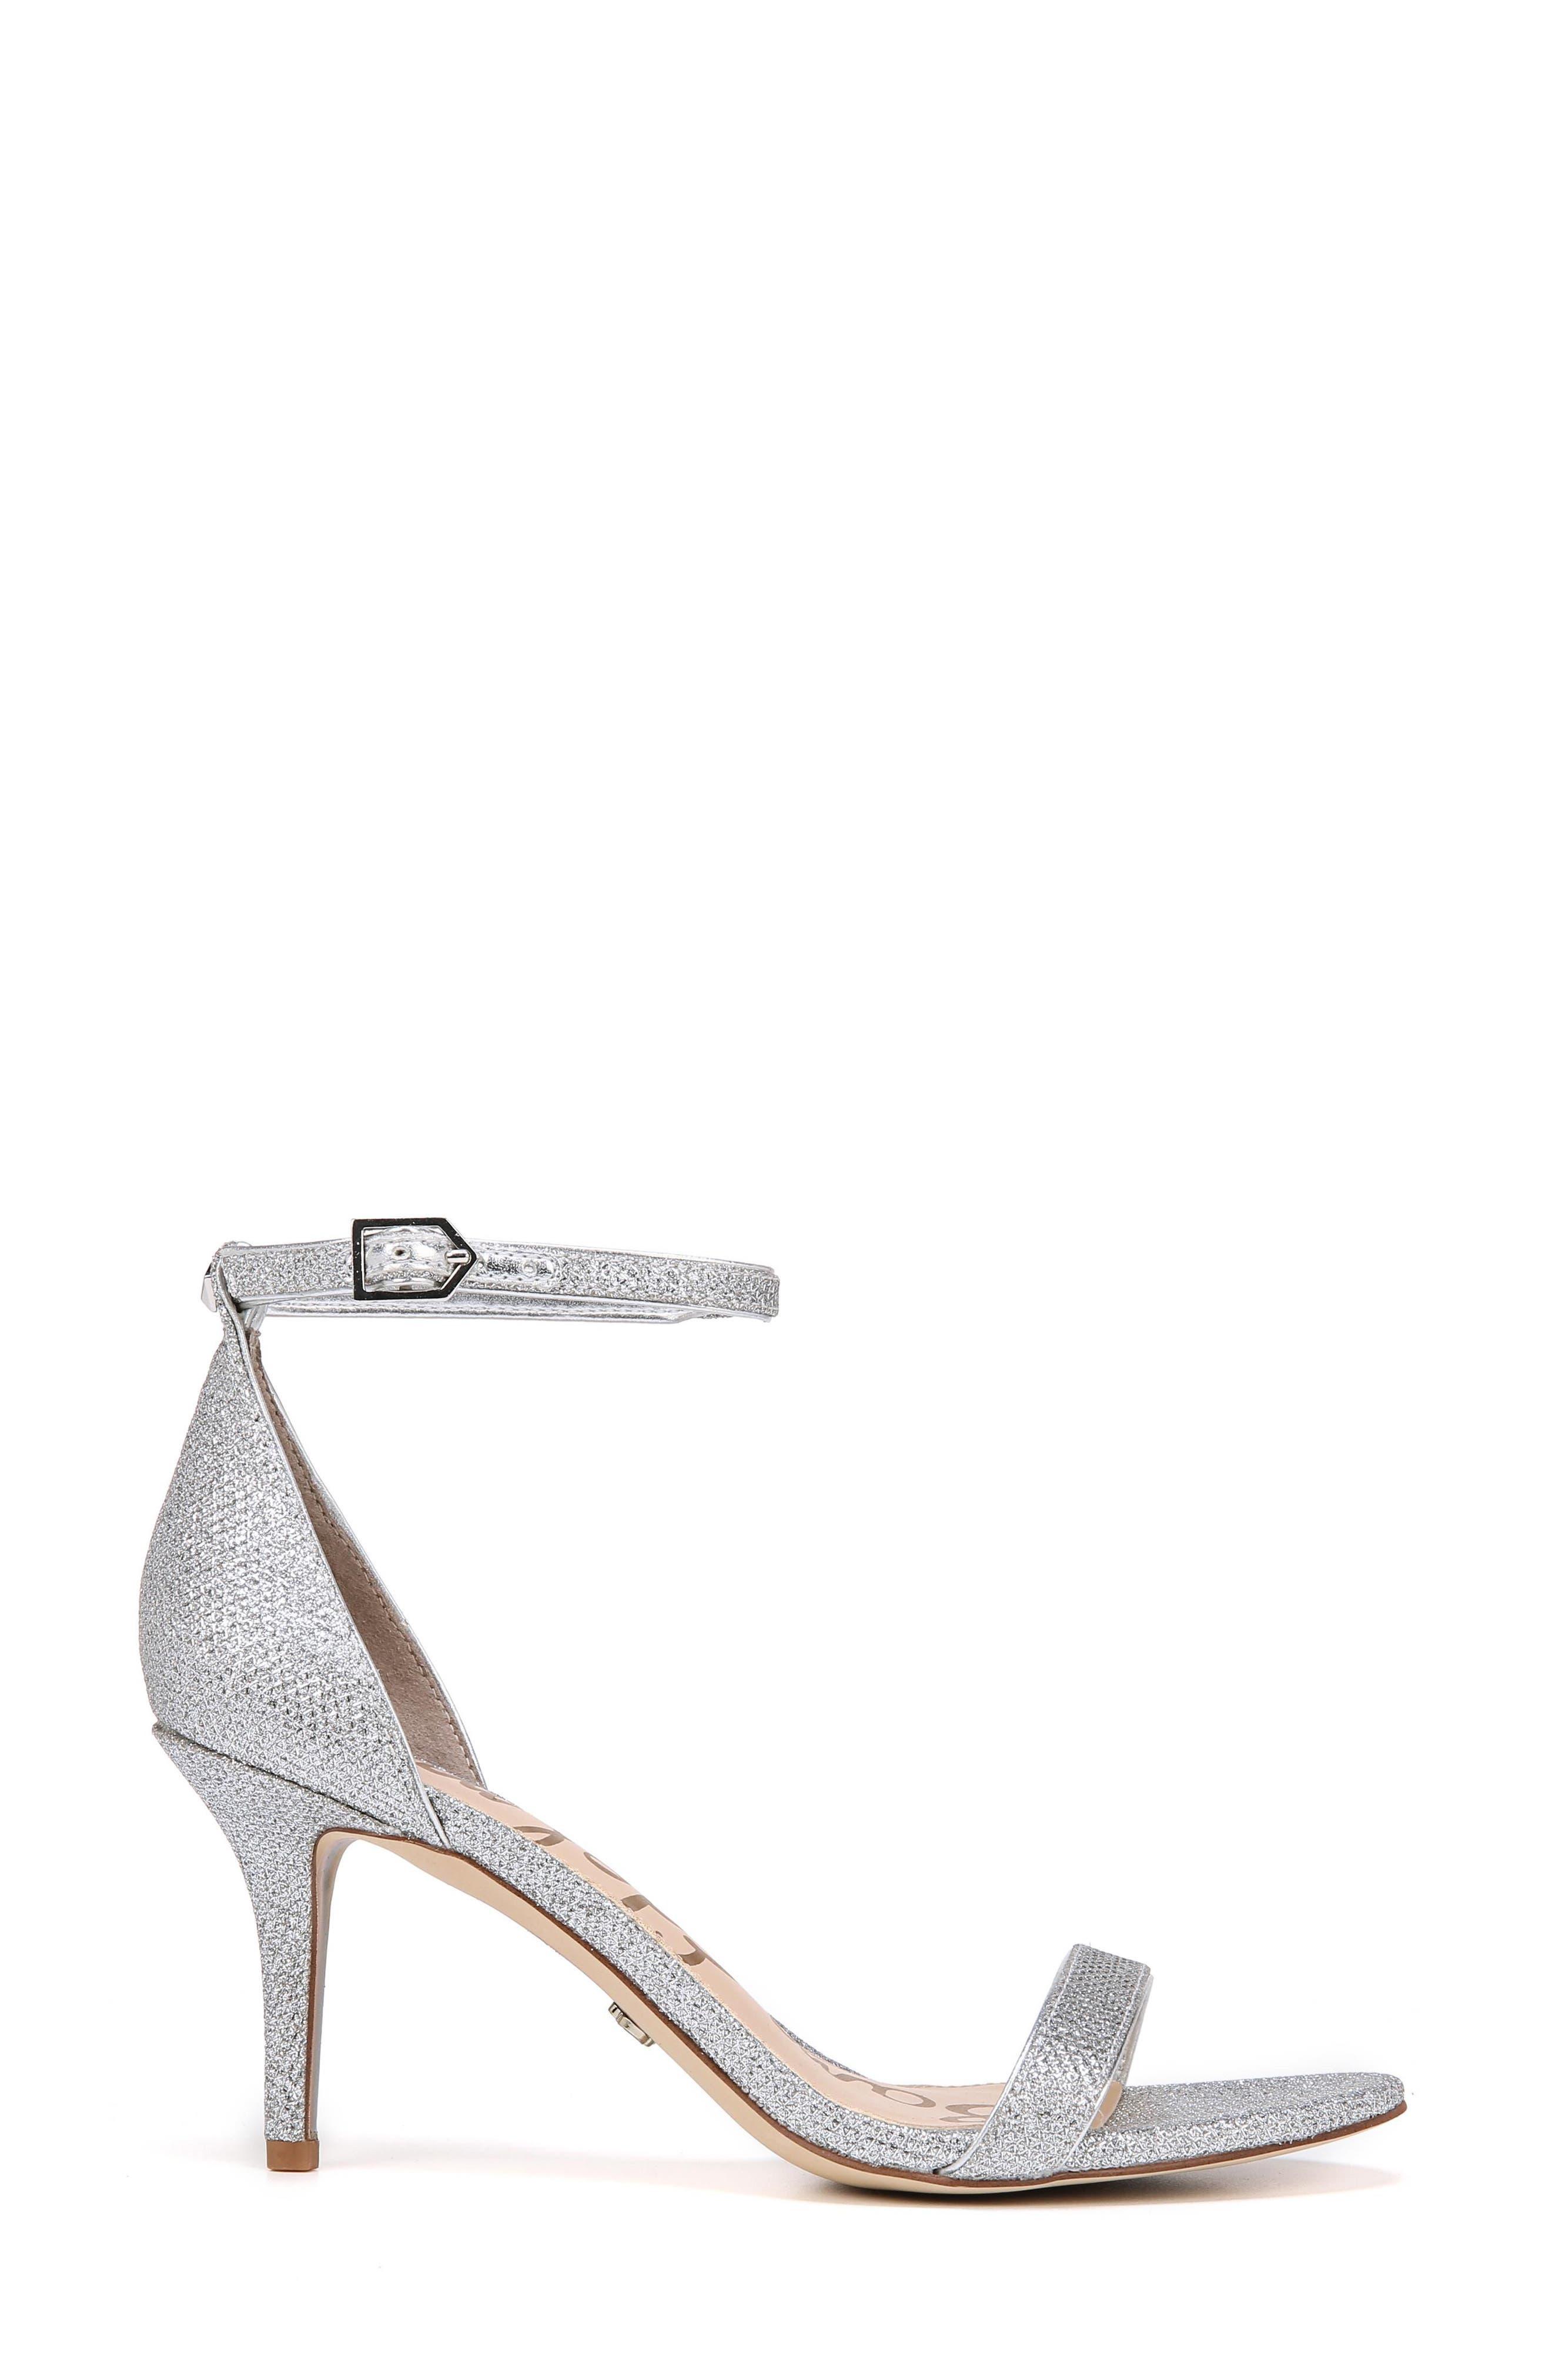 ,                             'Patti' Ankle Strap Sandal,                             Alternate thumbnail 35, color,                             041